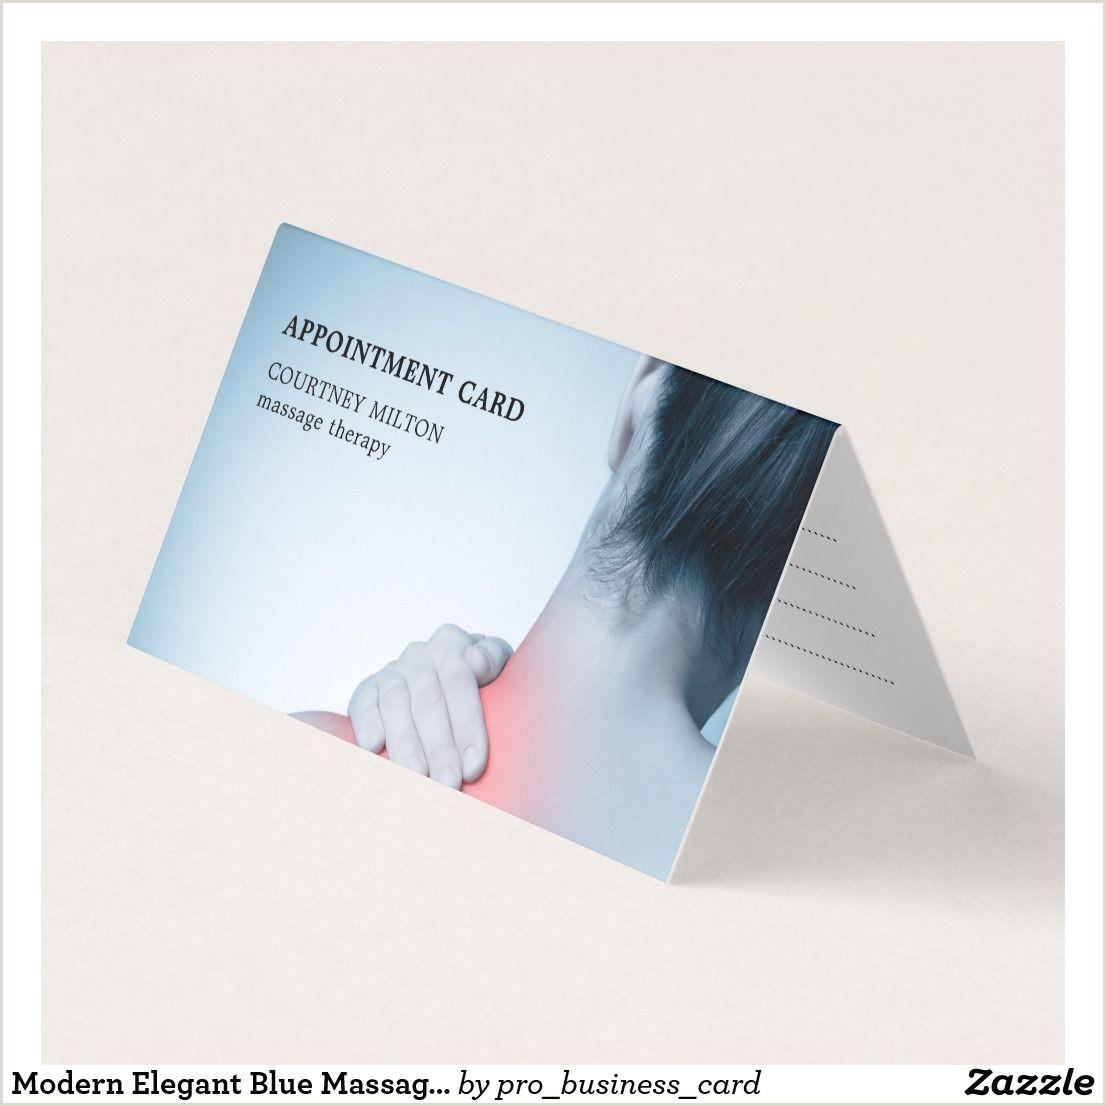 Business Card Pinterest Modern Elegant Blue Massage Therapist Appointment